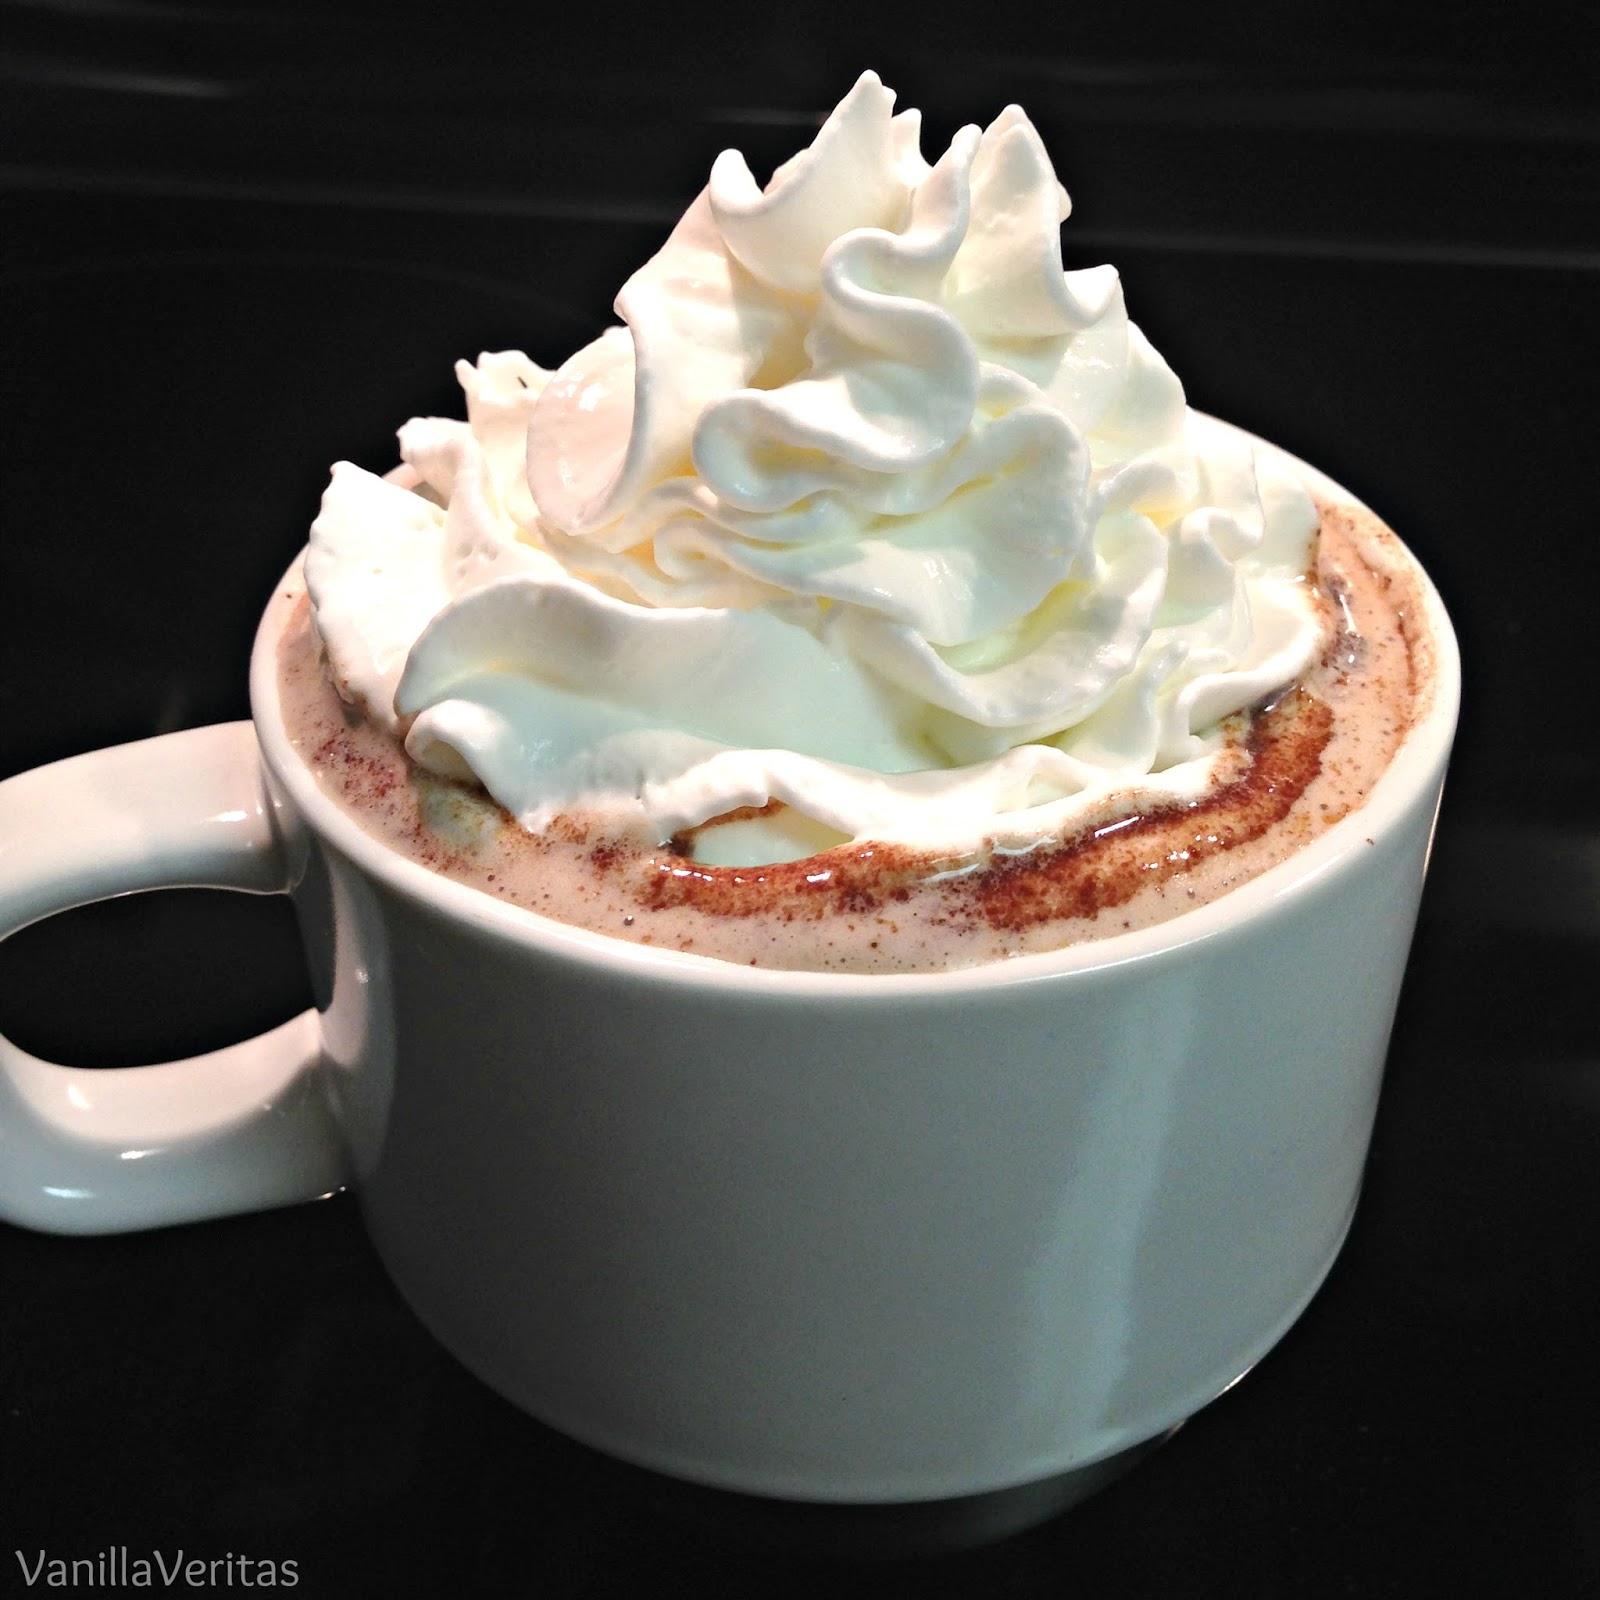 hot chocolate | hot cocoa | chocolate milk | chocolate | cocoa | cinnamon | caramel | fast dessert | easy dessert | quick dessert | warm drink